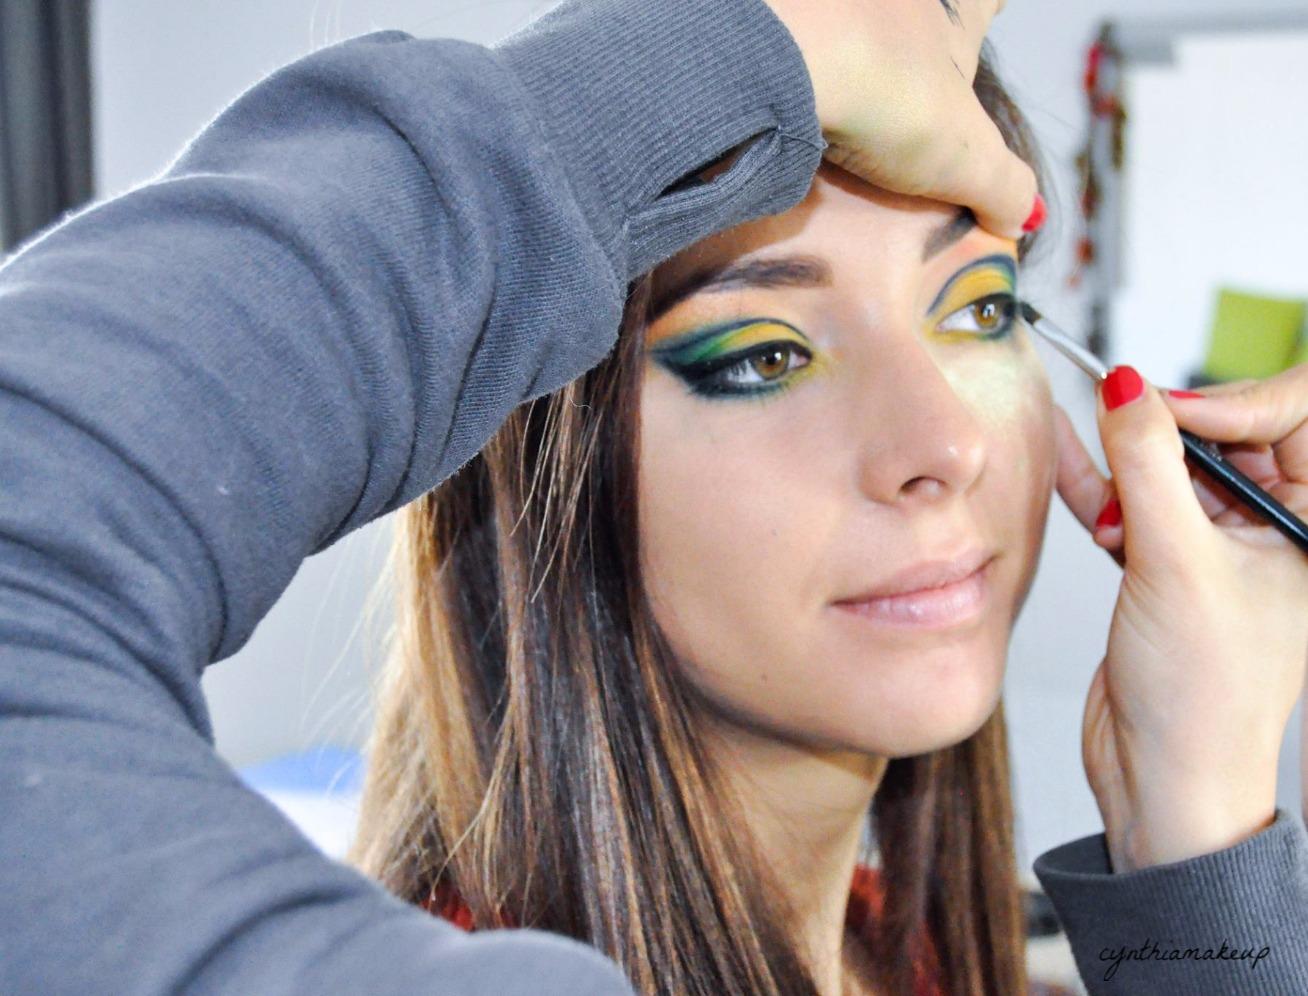 maquillage artistique cynthia_edited